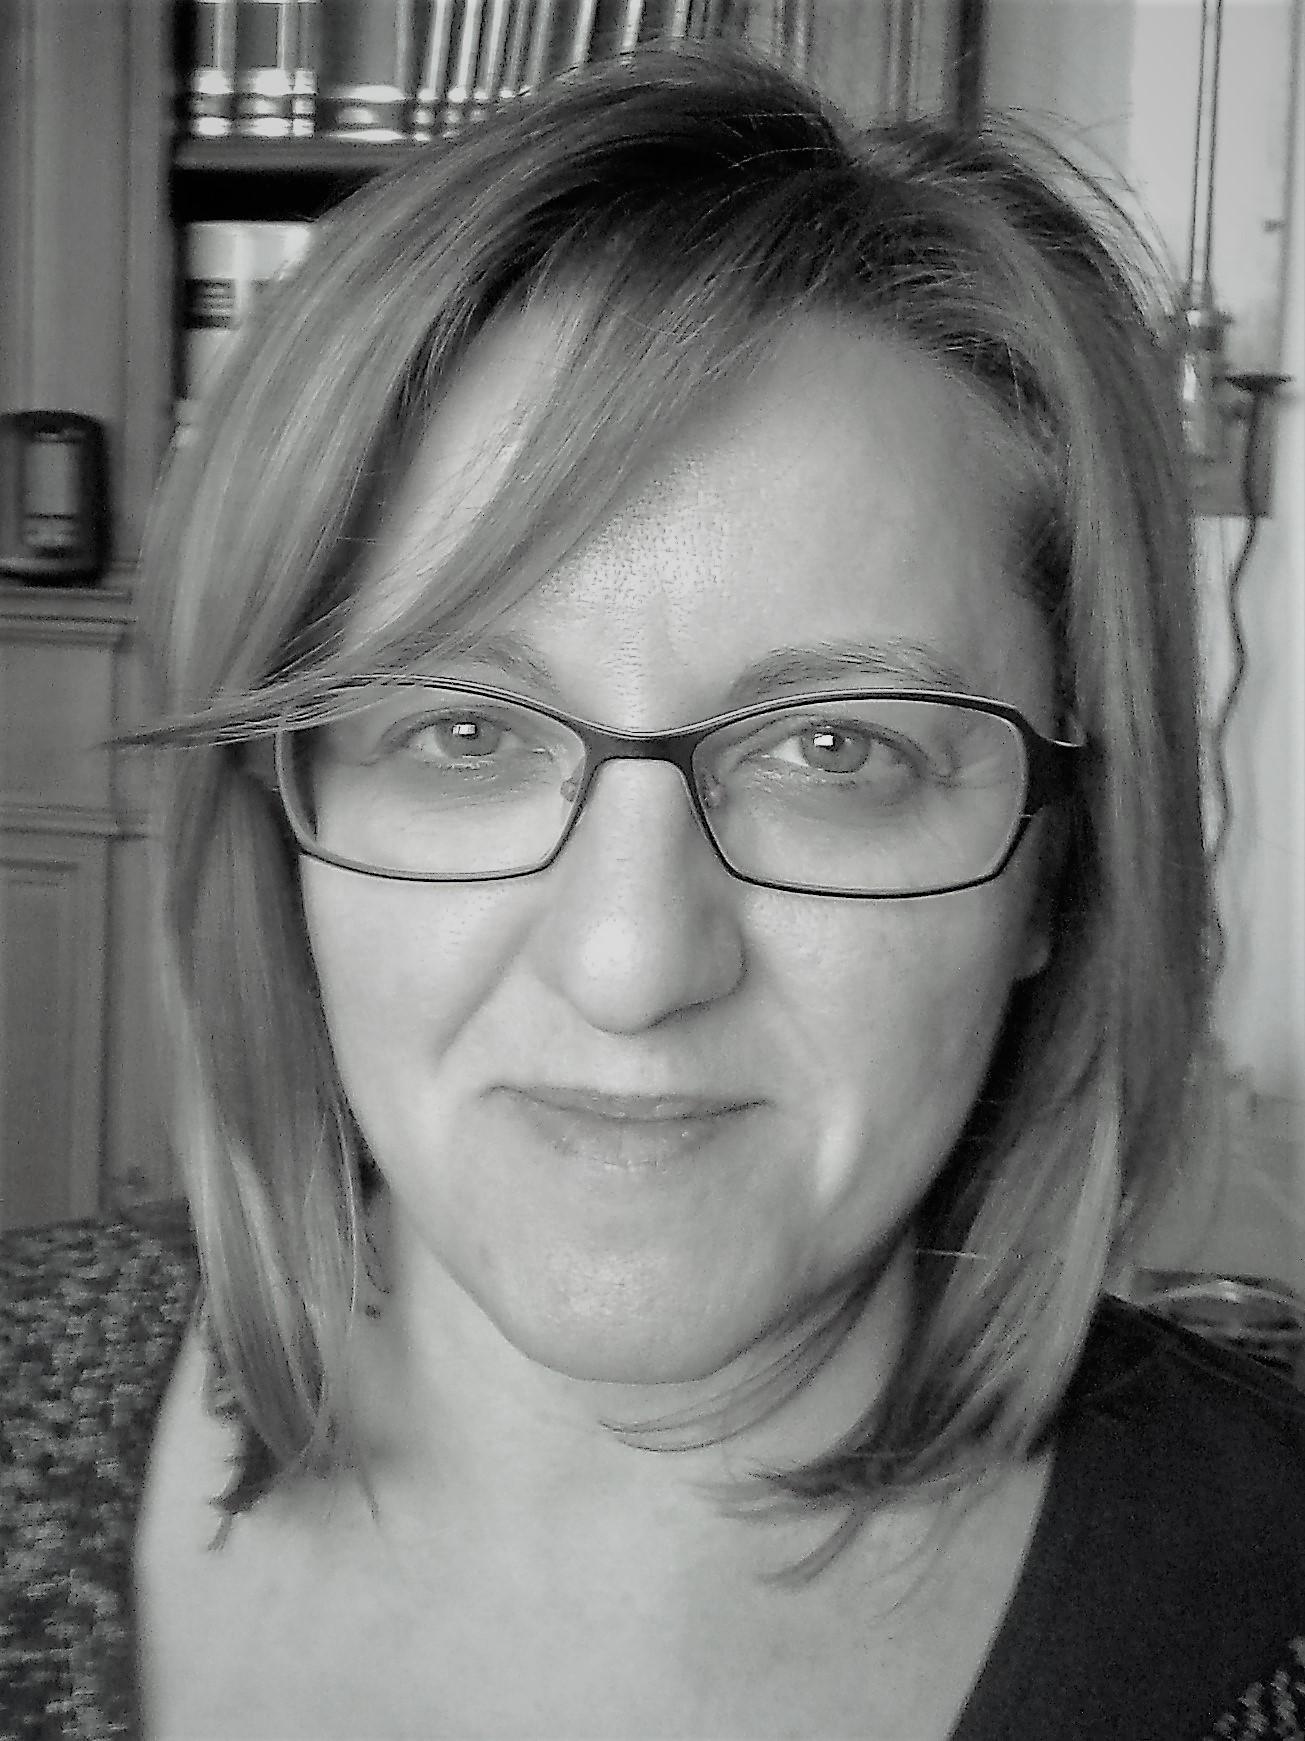 L. (Laura) Valiani